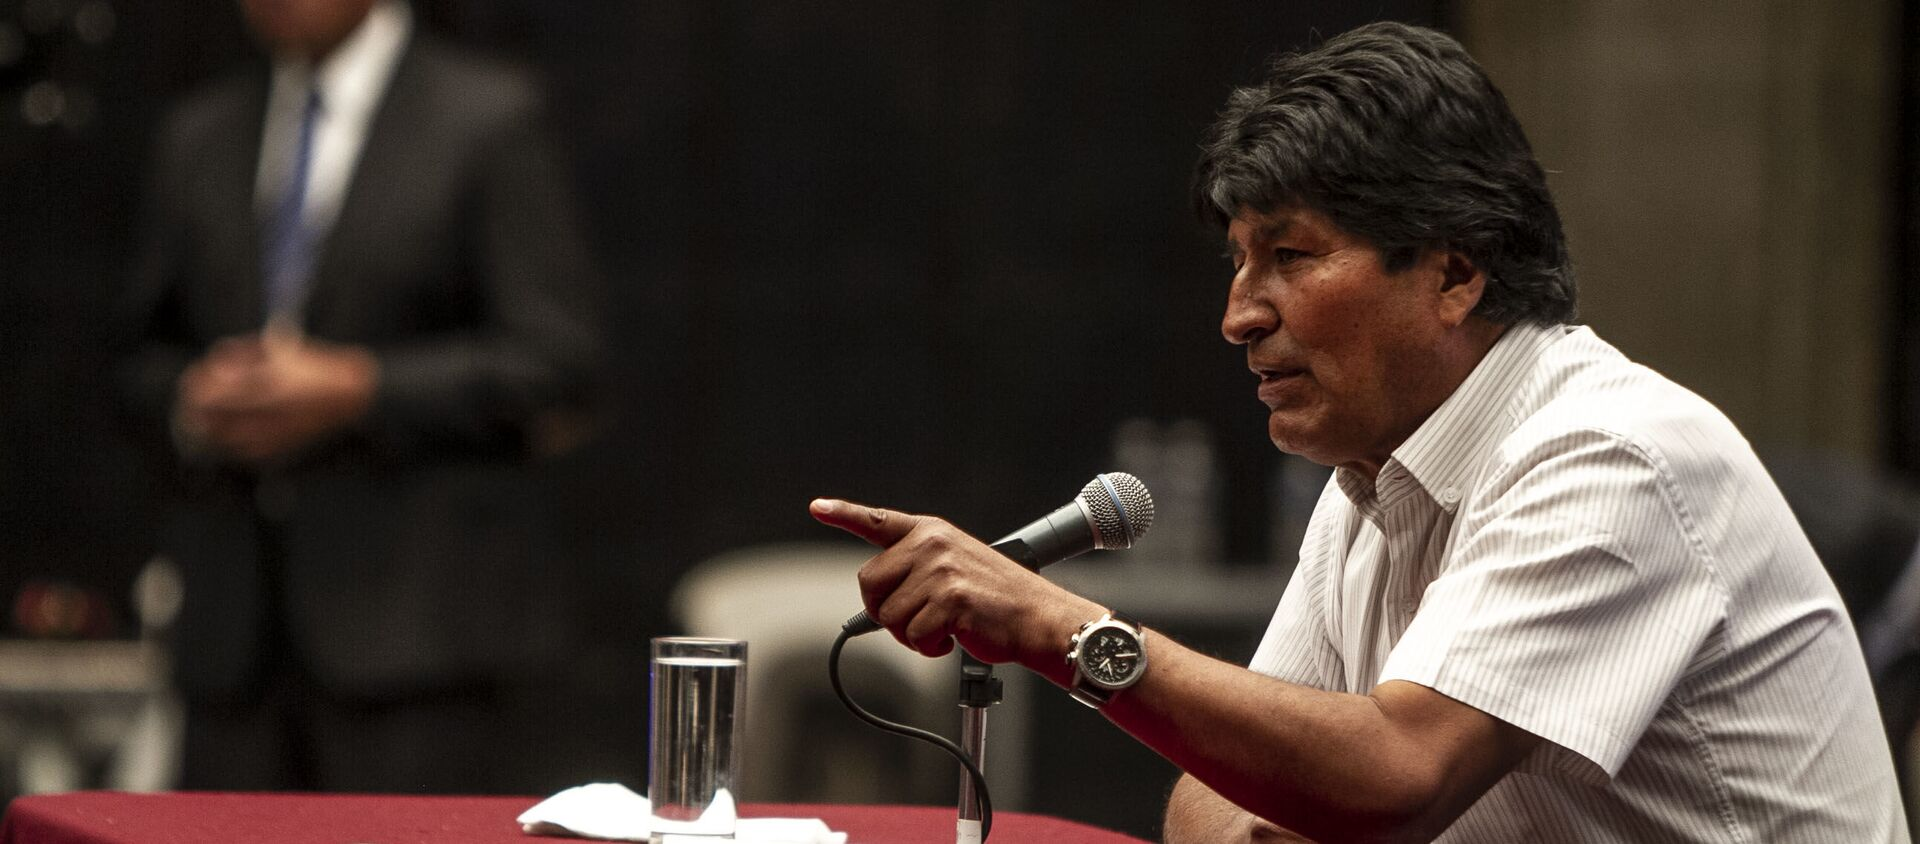 Evo Morales, expresidente de Bolivia (archivo) - Sputnik Mundo, 1920, 27.02.2020